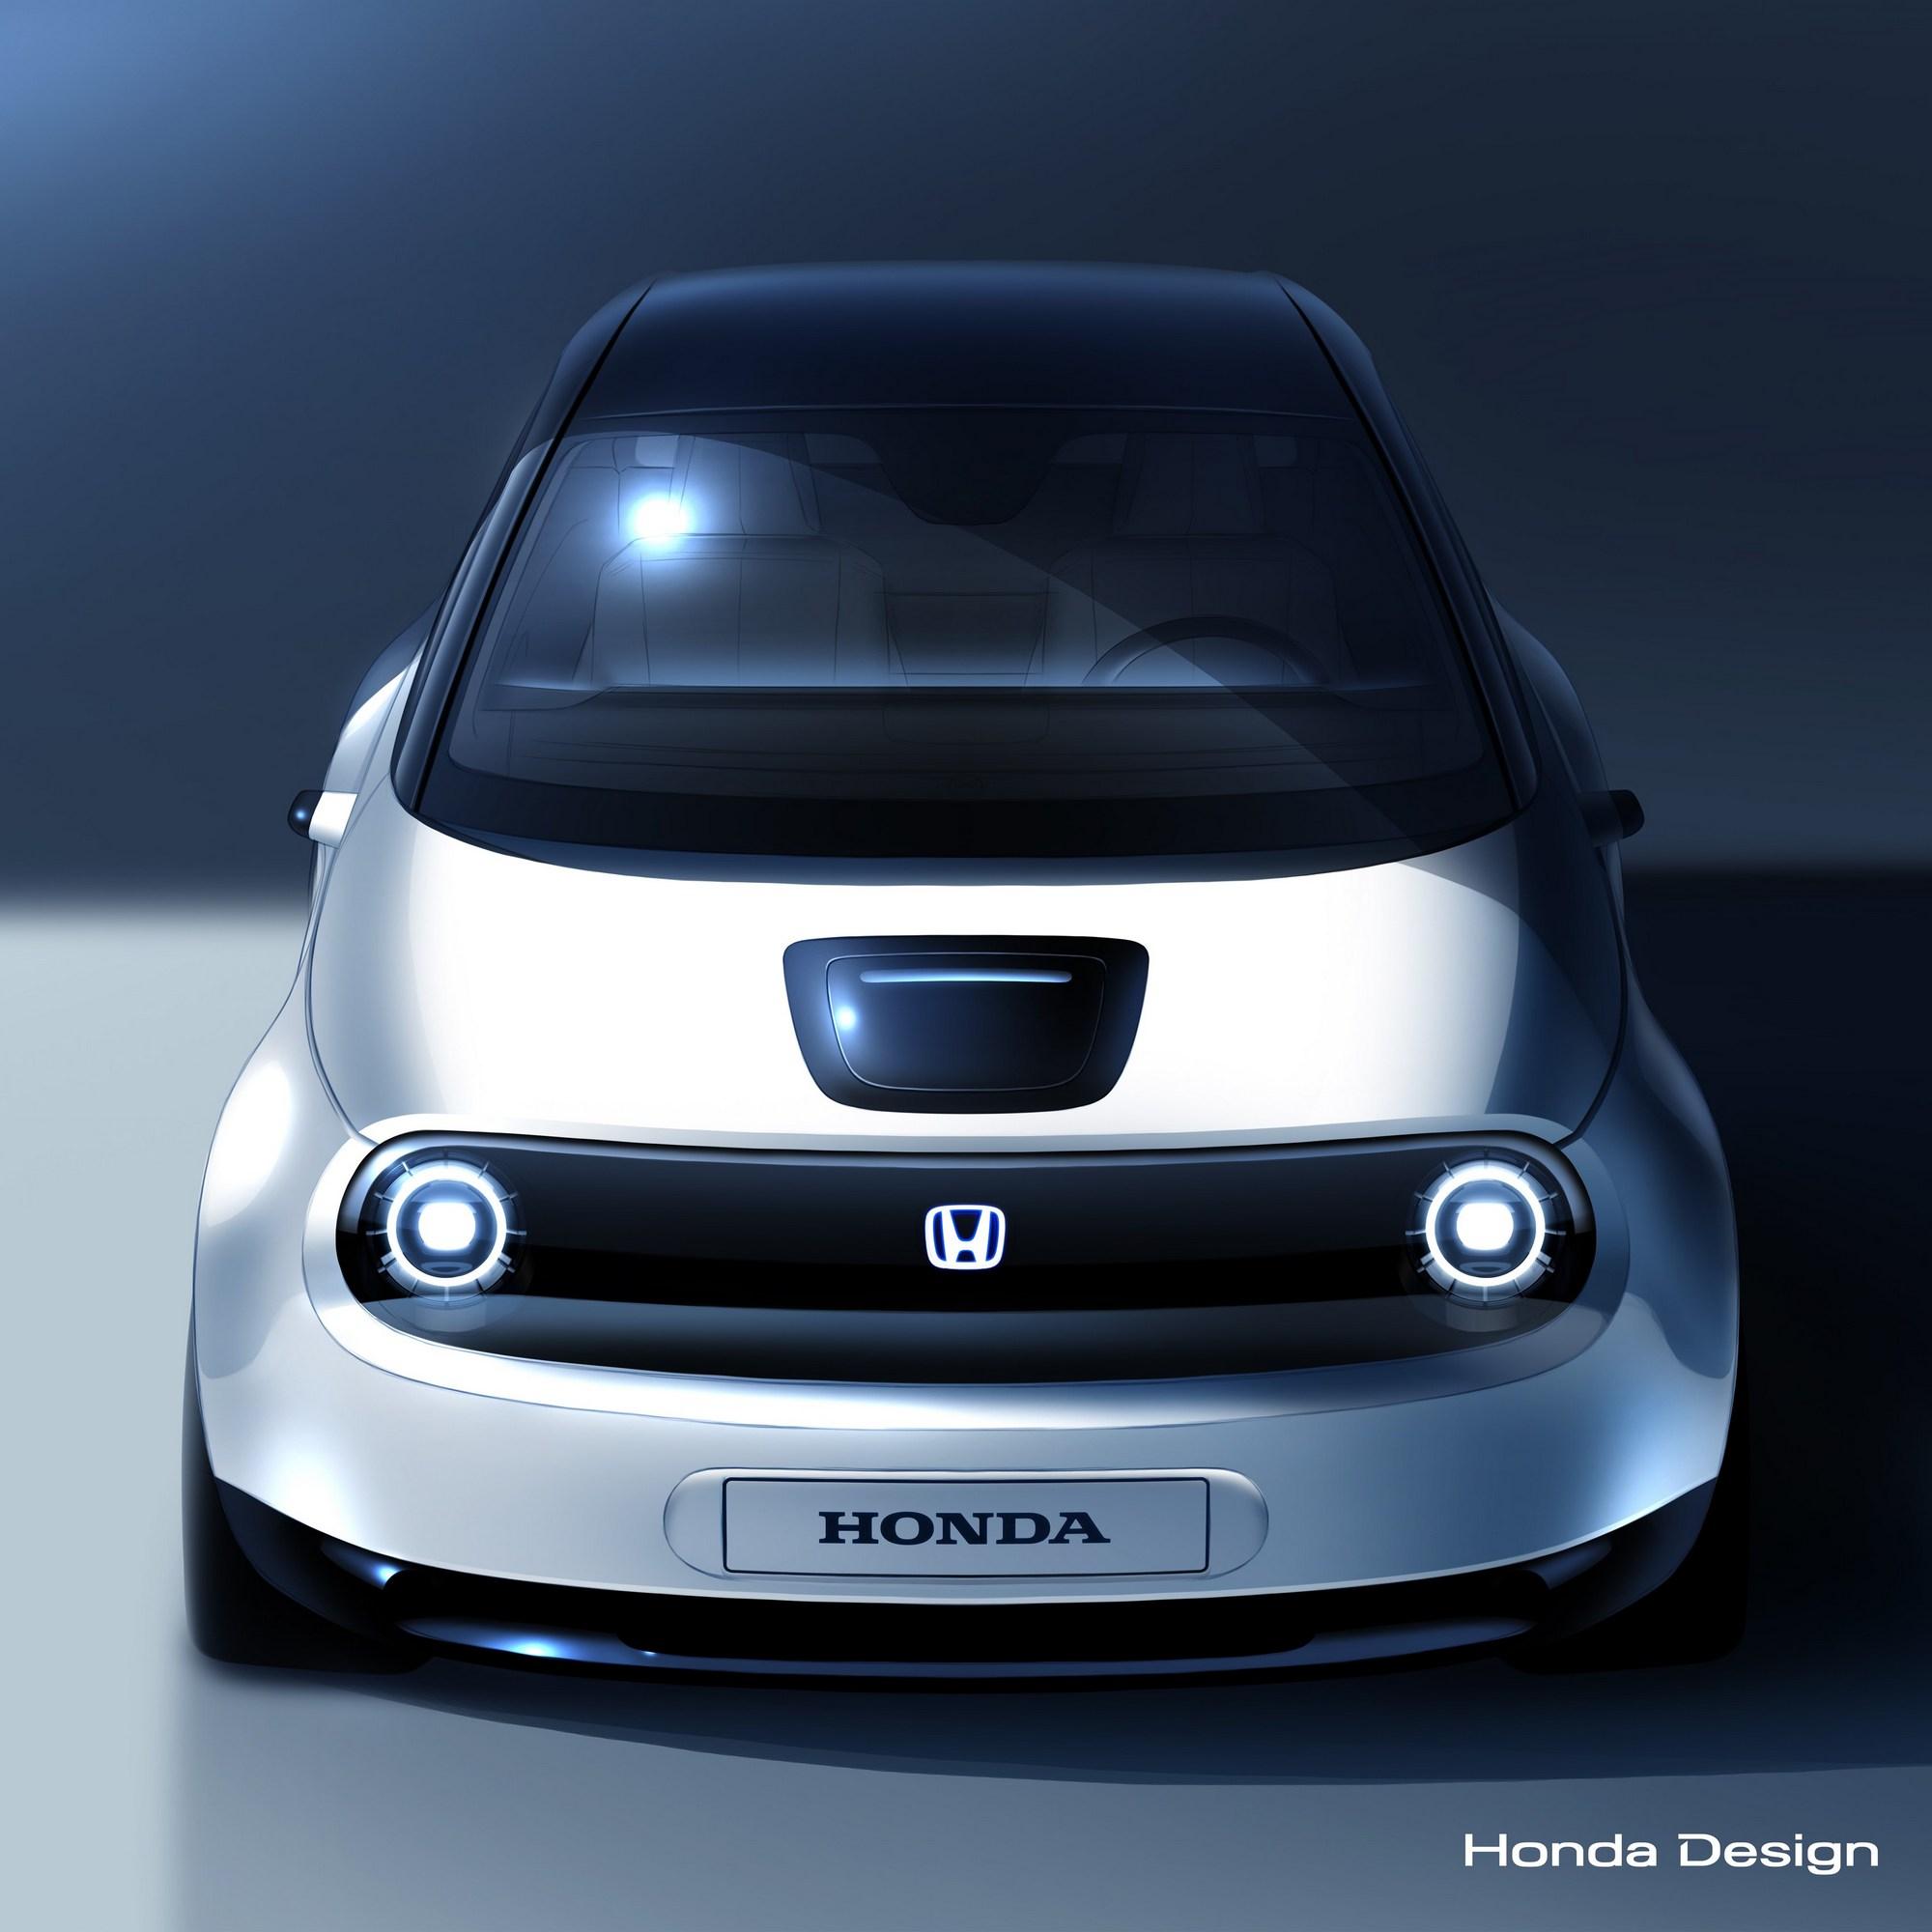 ВЖеневе представят новейшую модель от Хонда - Mail.ru Авто